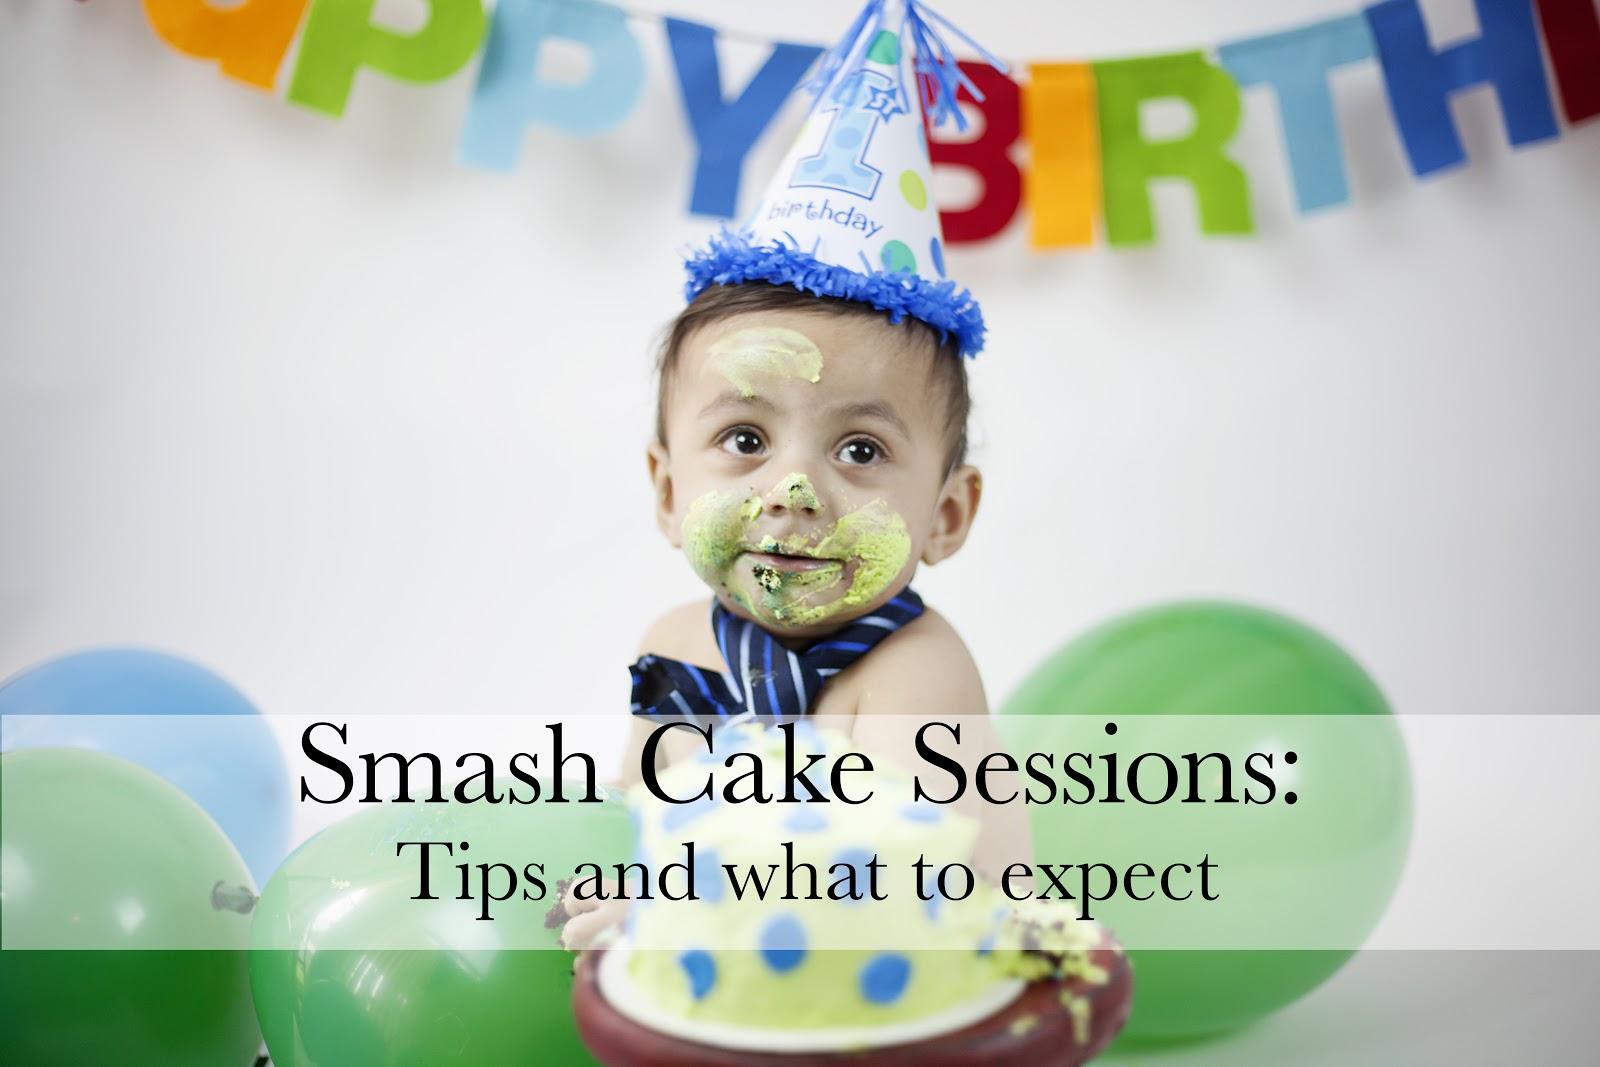 Sensational Jt Photography Okc Llc Blog Funny Birthday Cards Online Inifofree Goldxyz